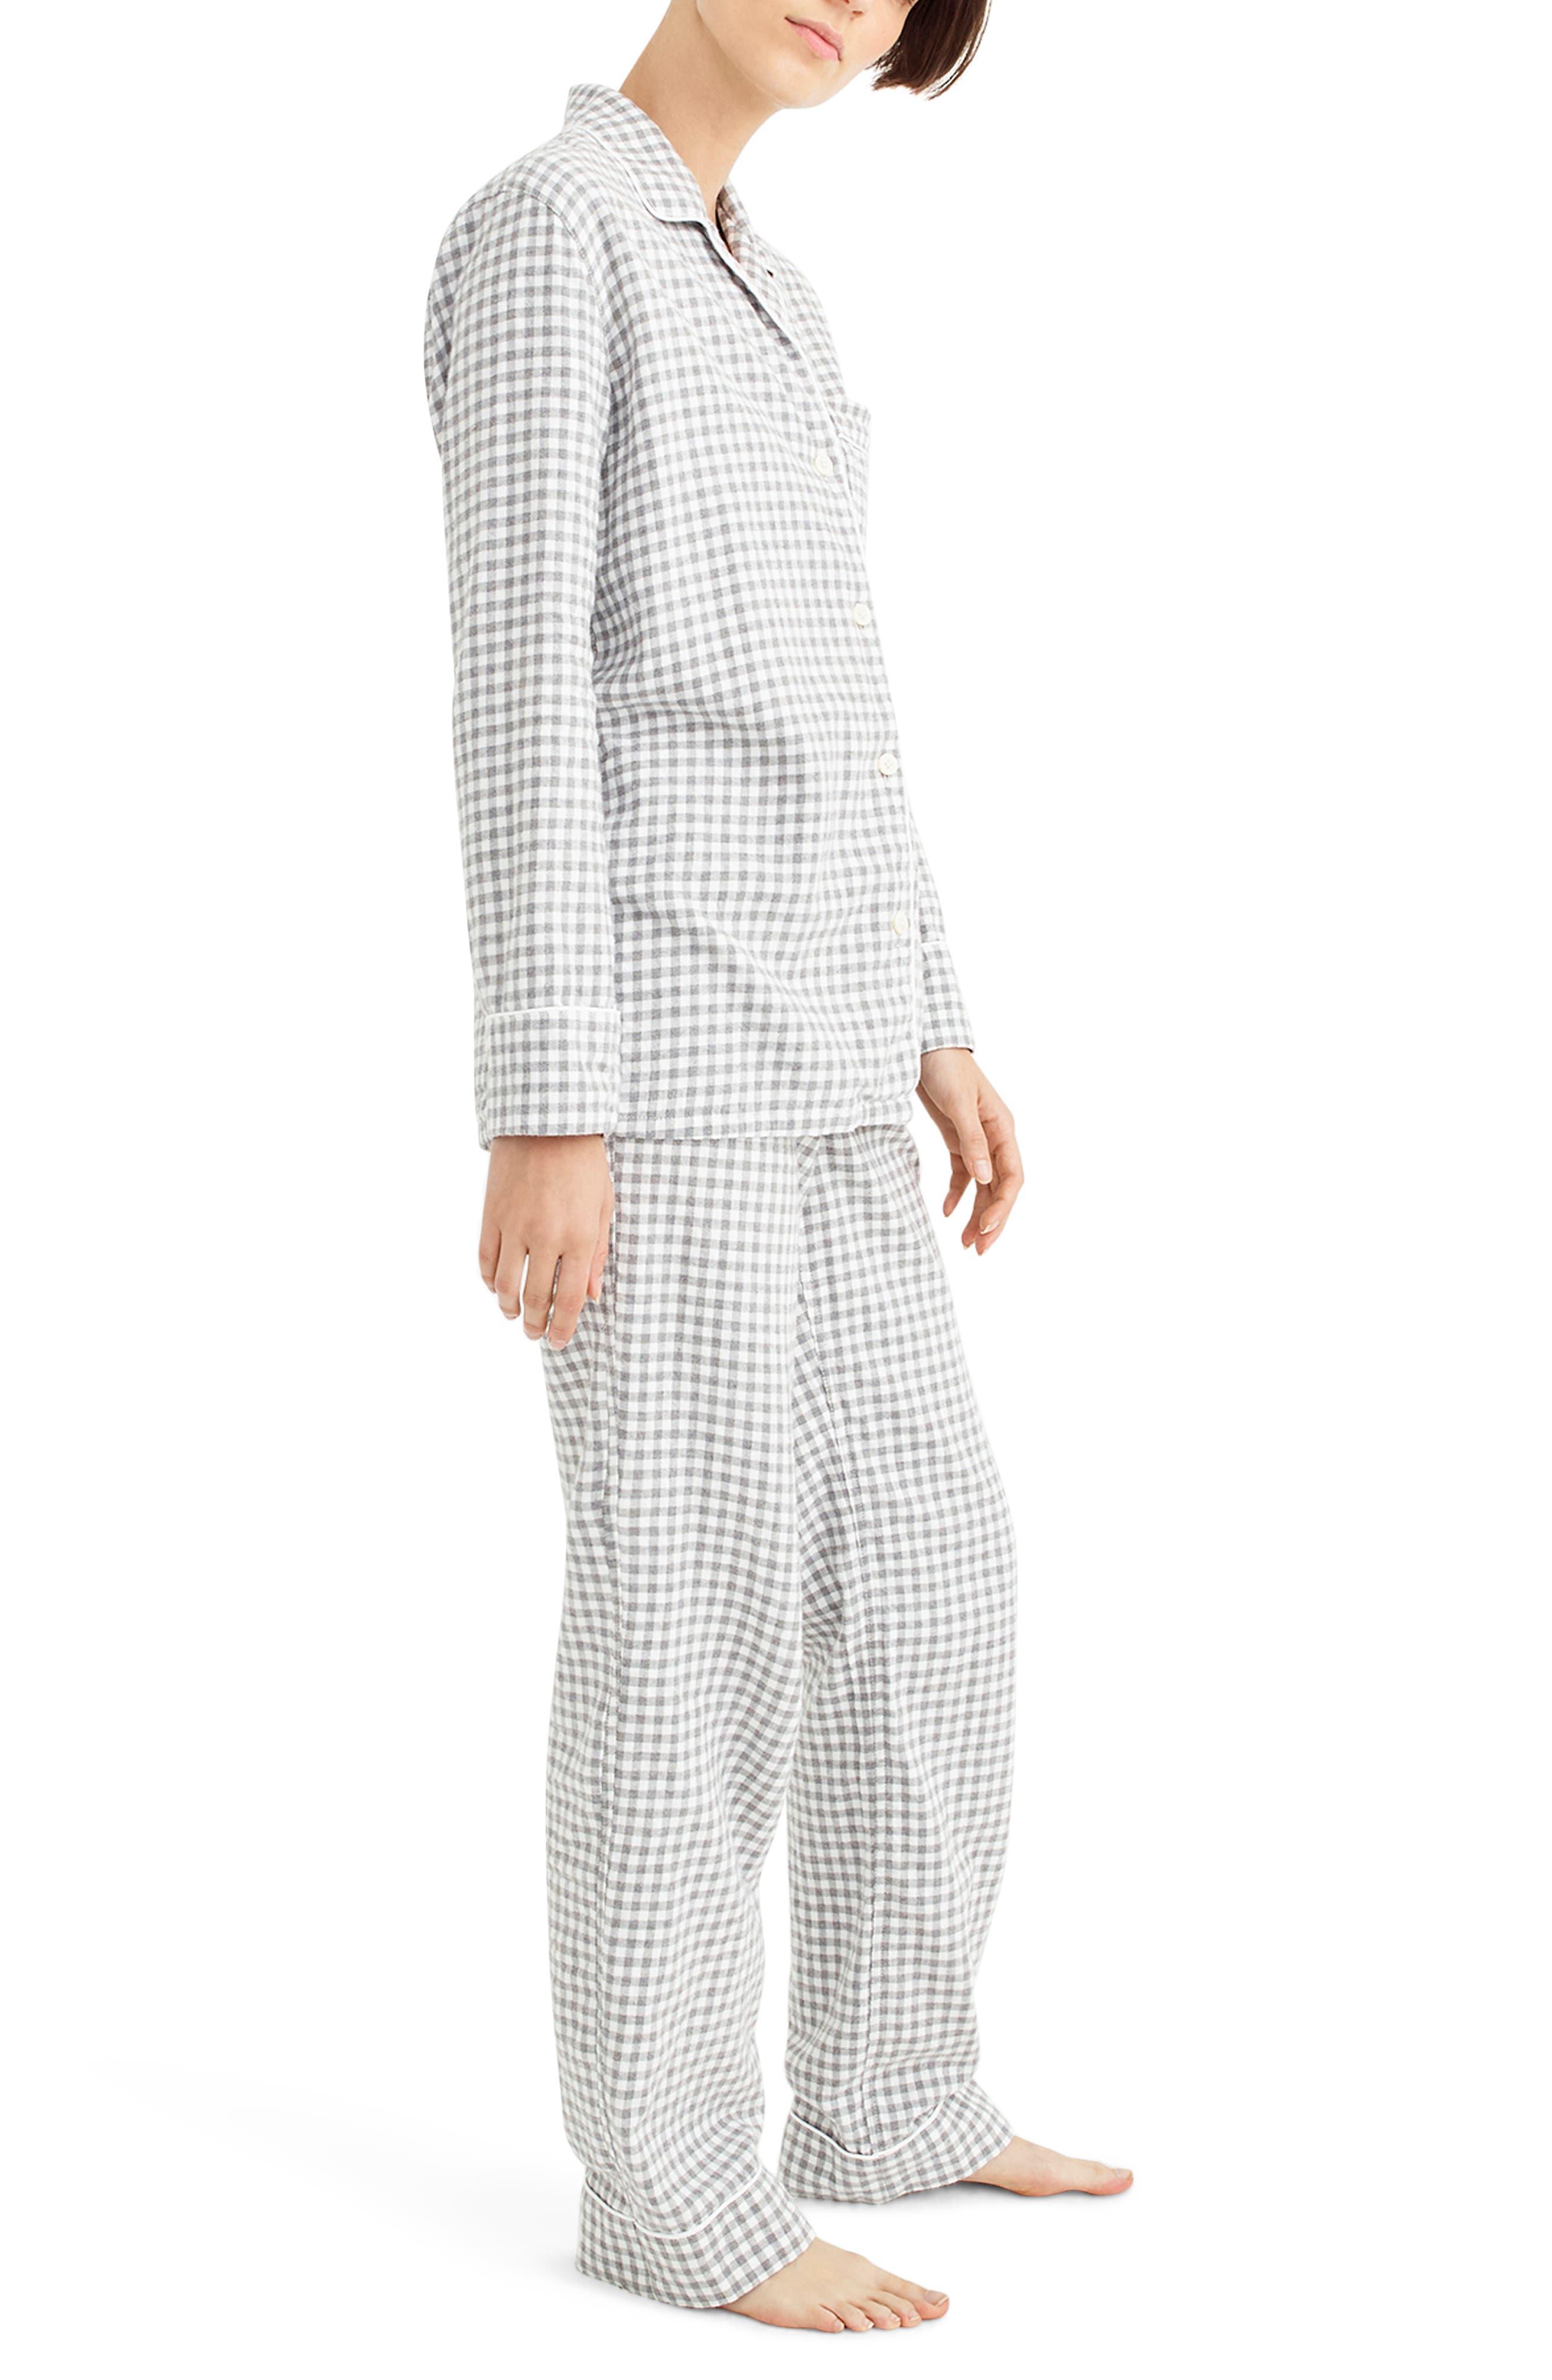 Gingham Flannel Pajamas,                             Alternate thumbnail 3, color,                             090